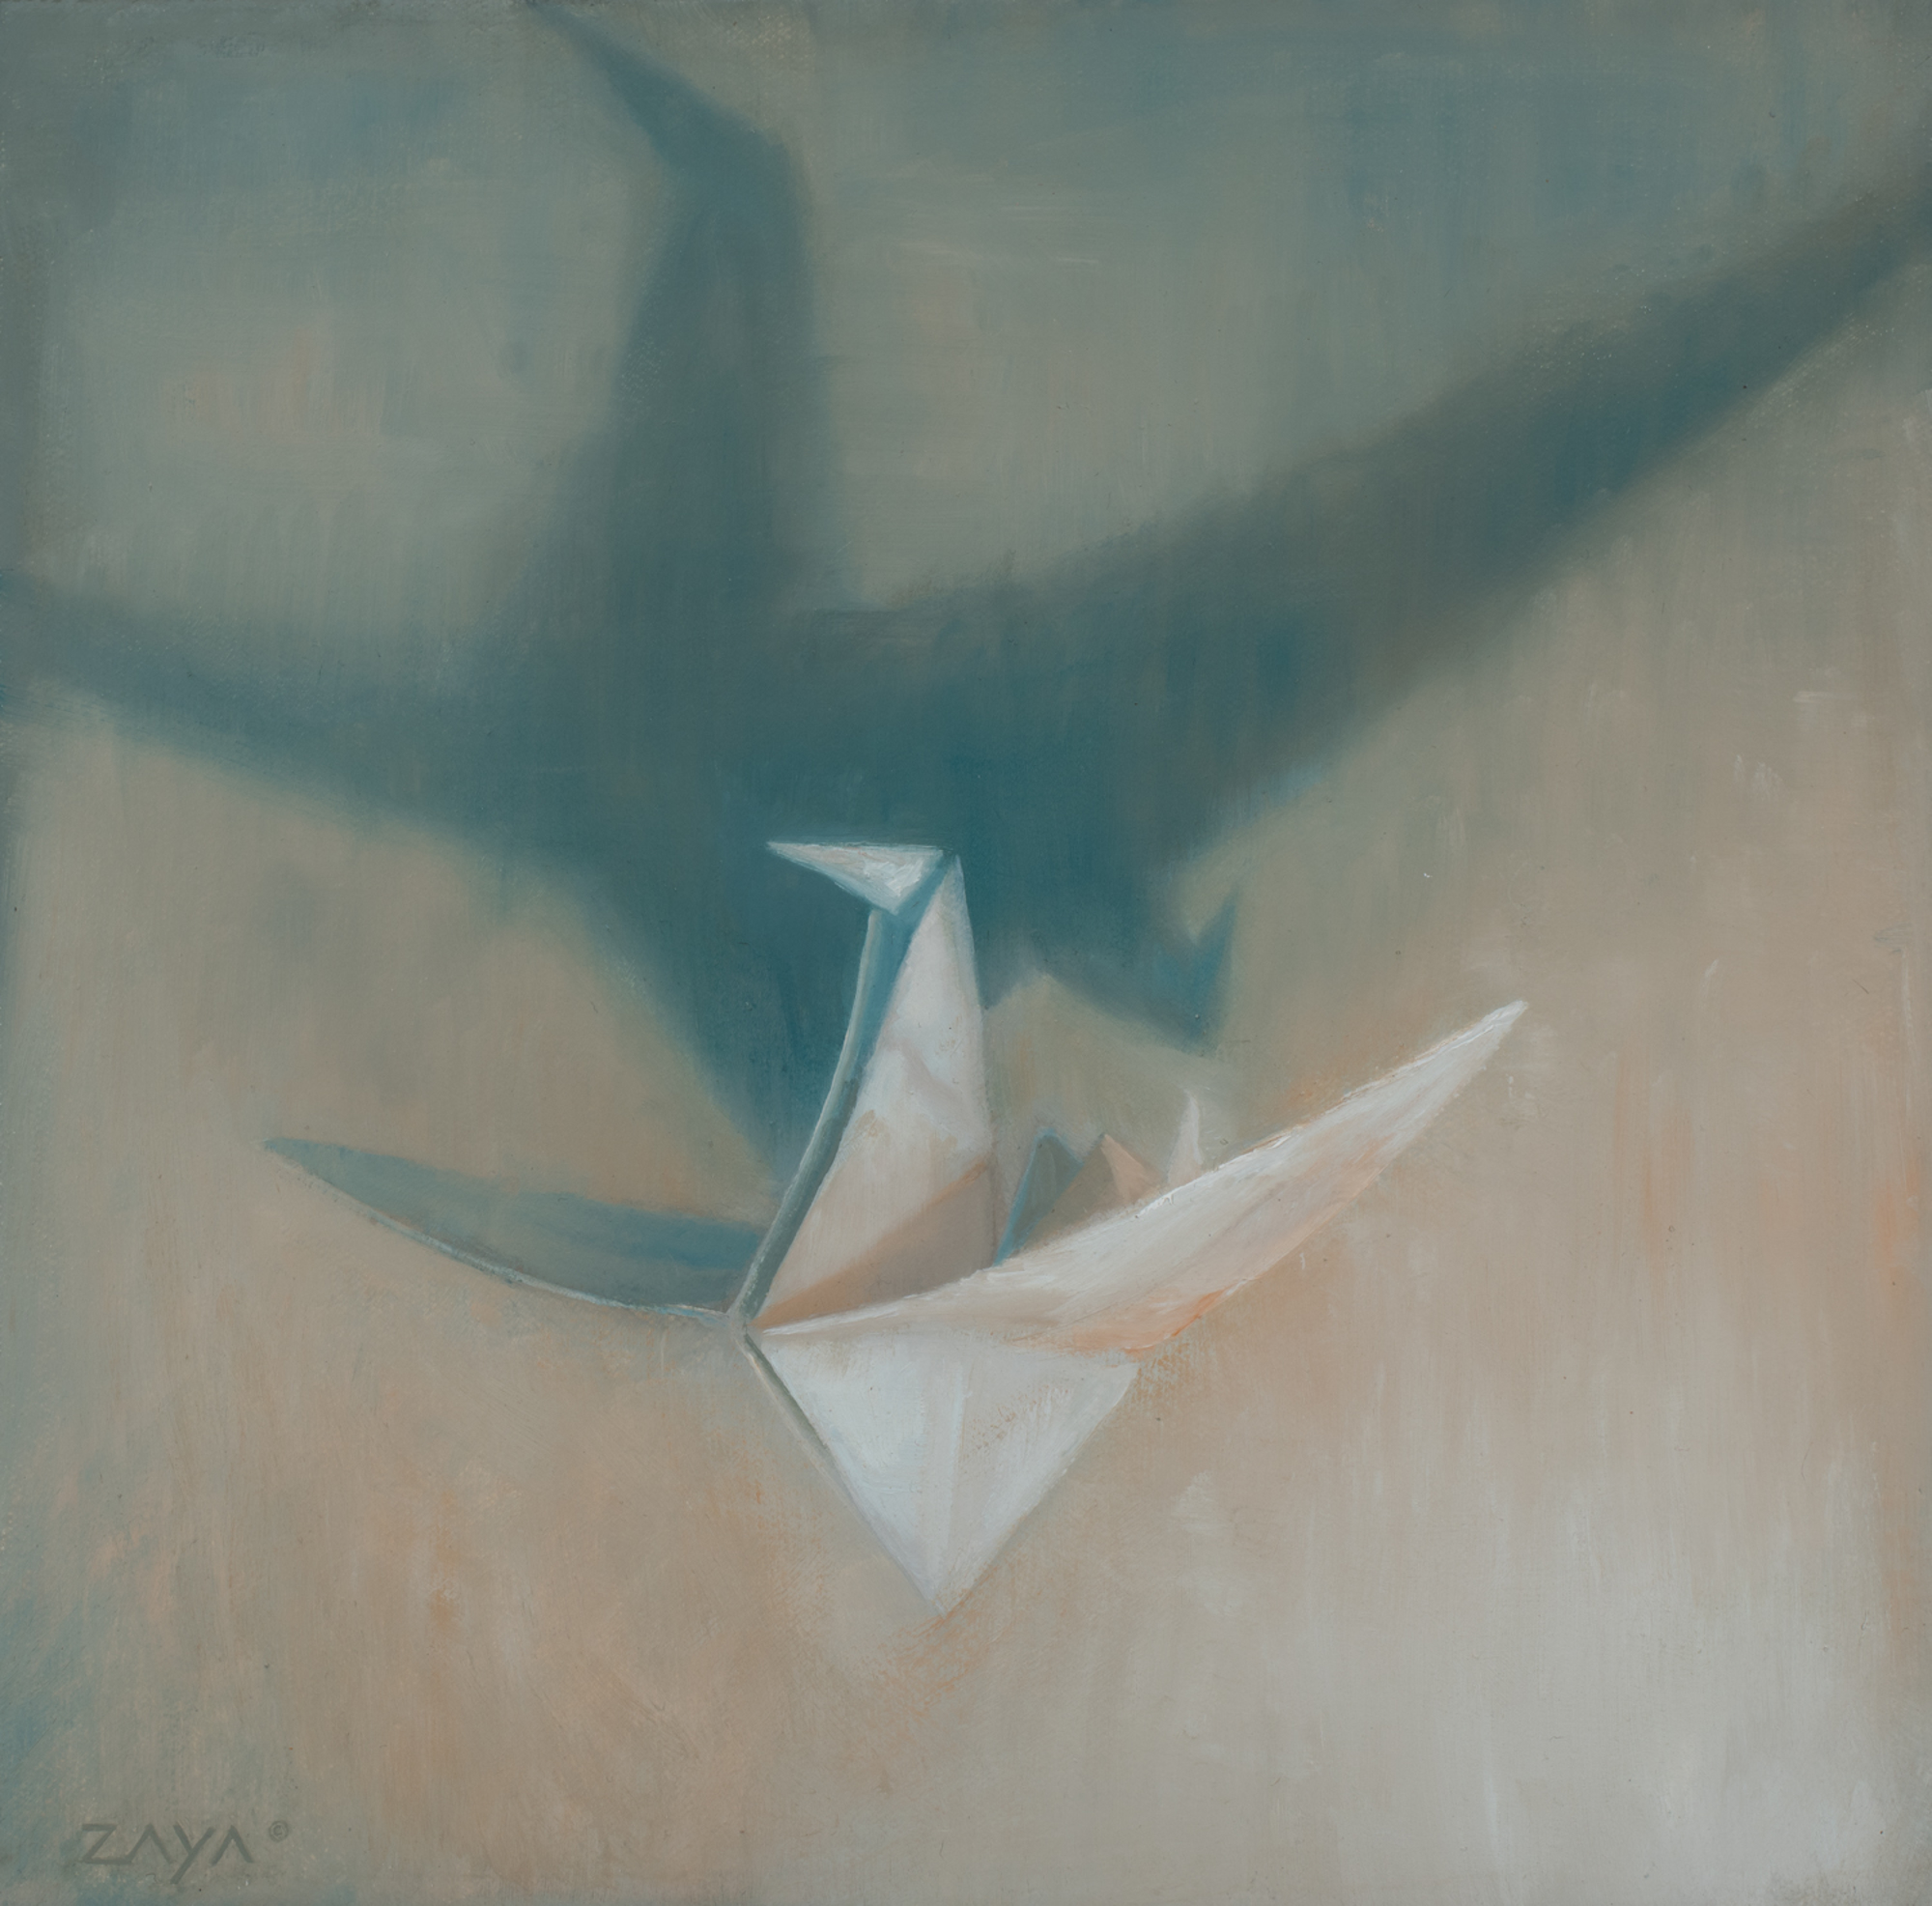 Paper Crane in Flight by Isaiah Ratterman